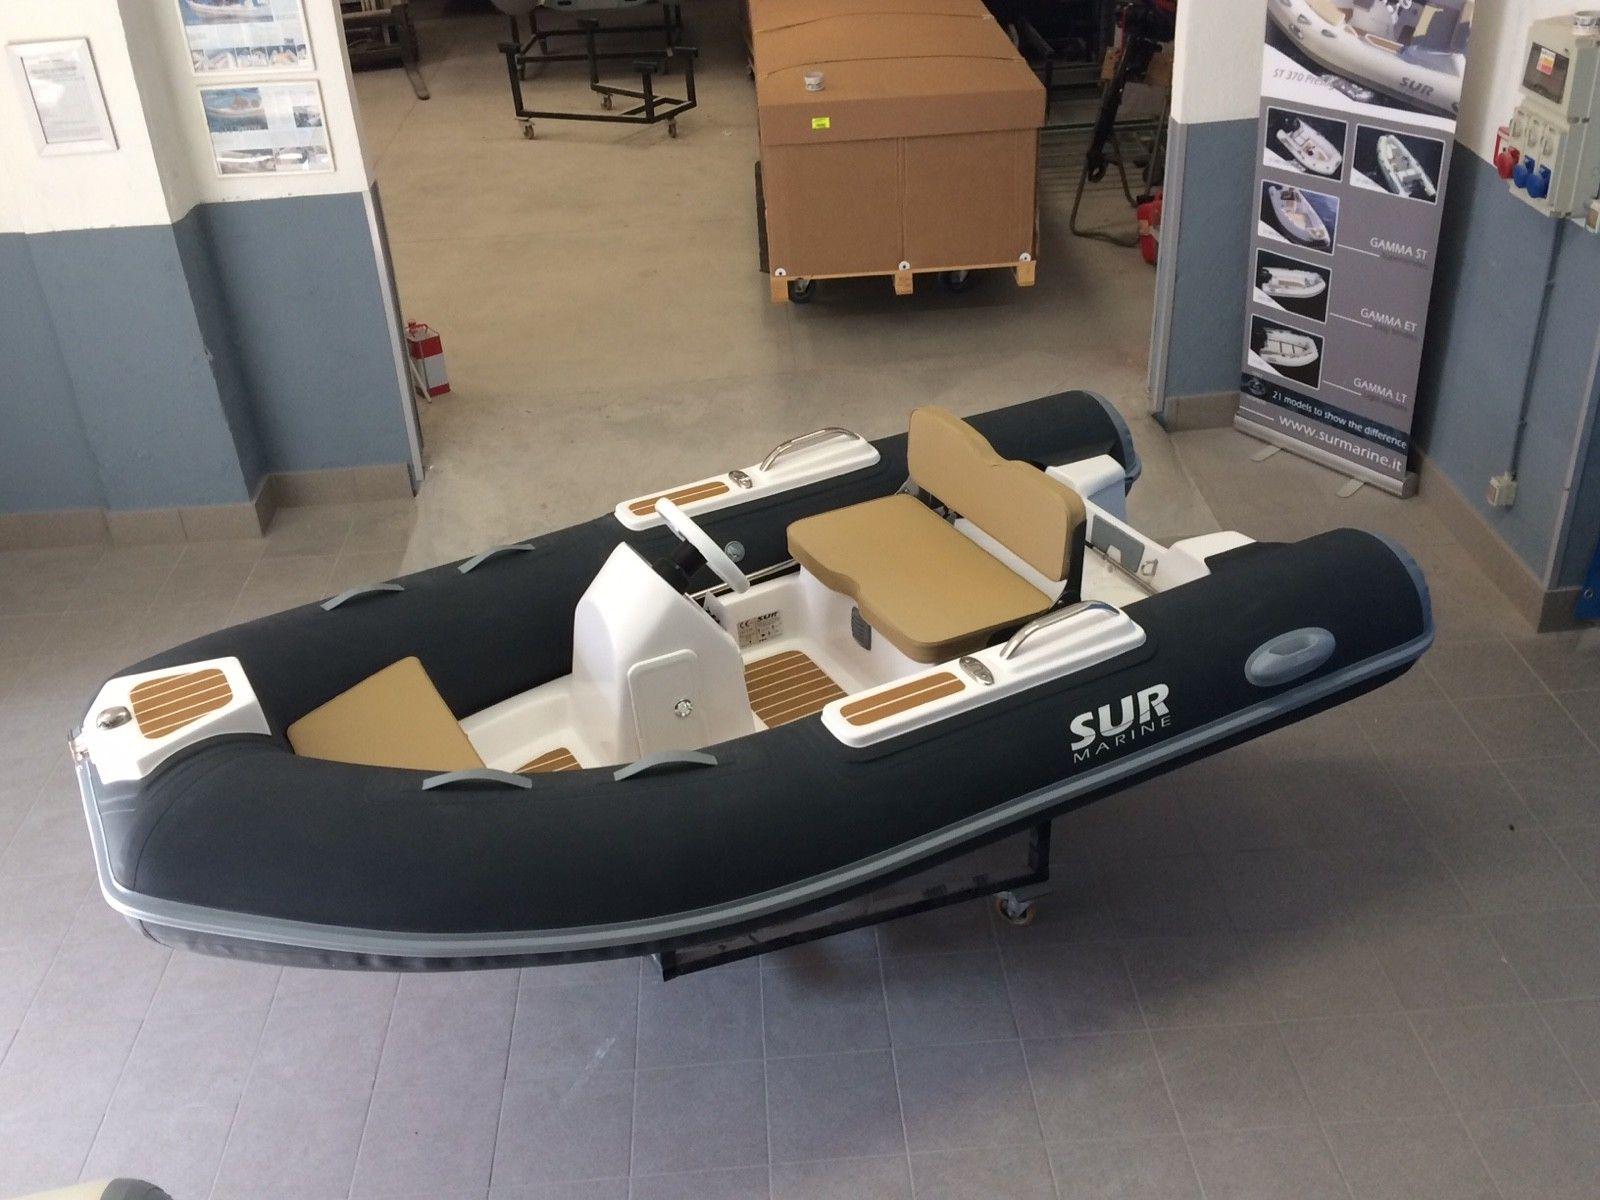 st 290 display boat .jpg